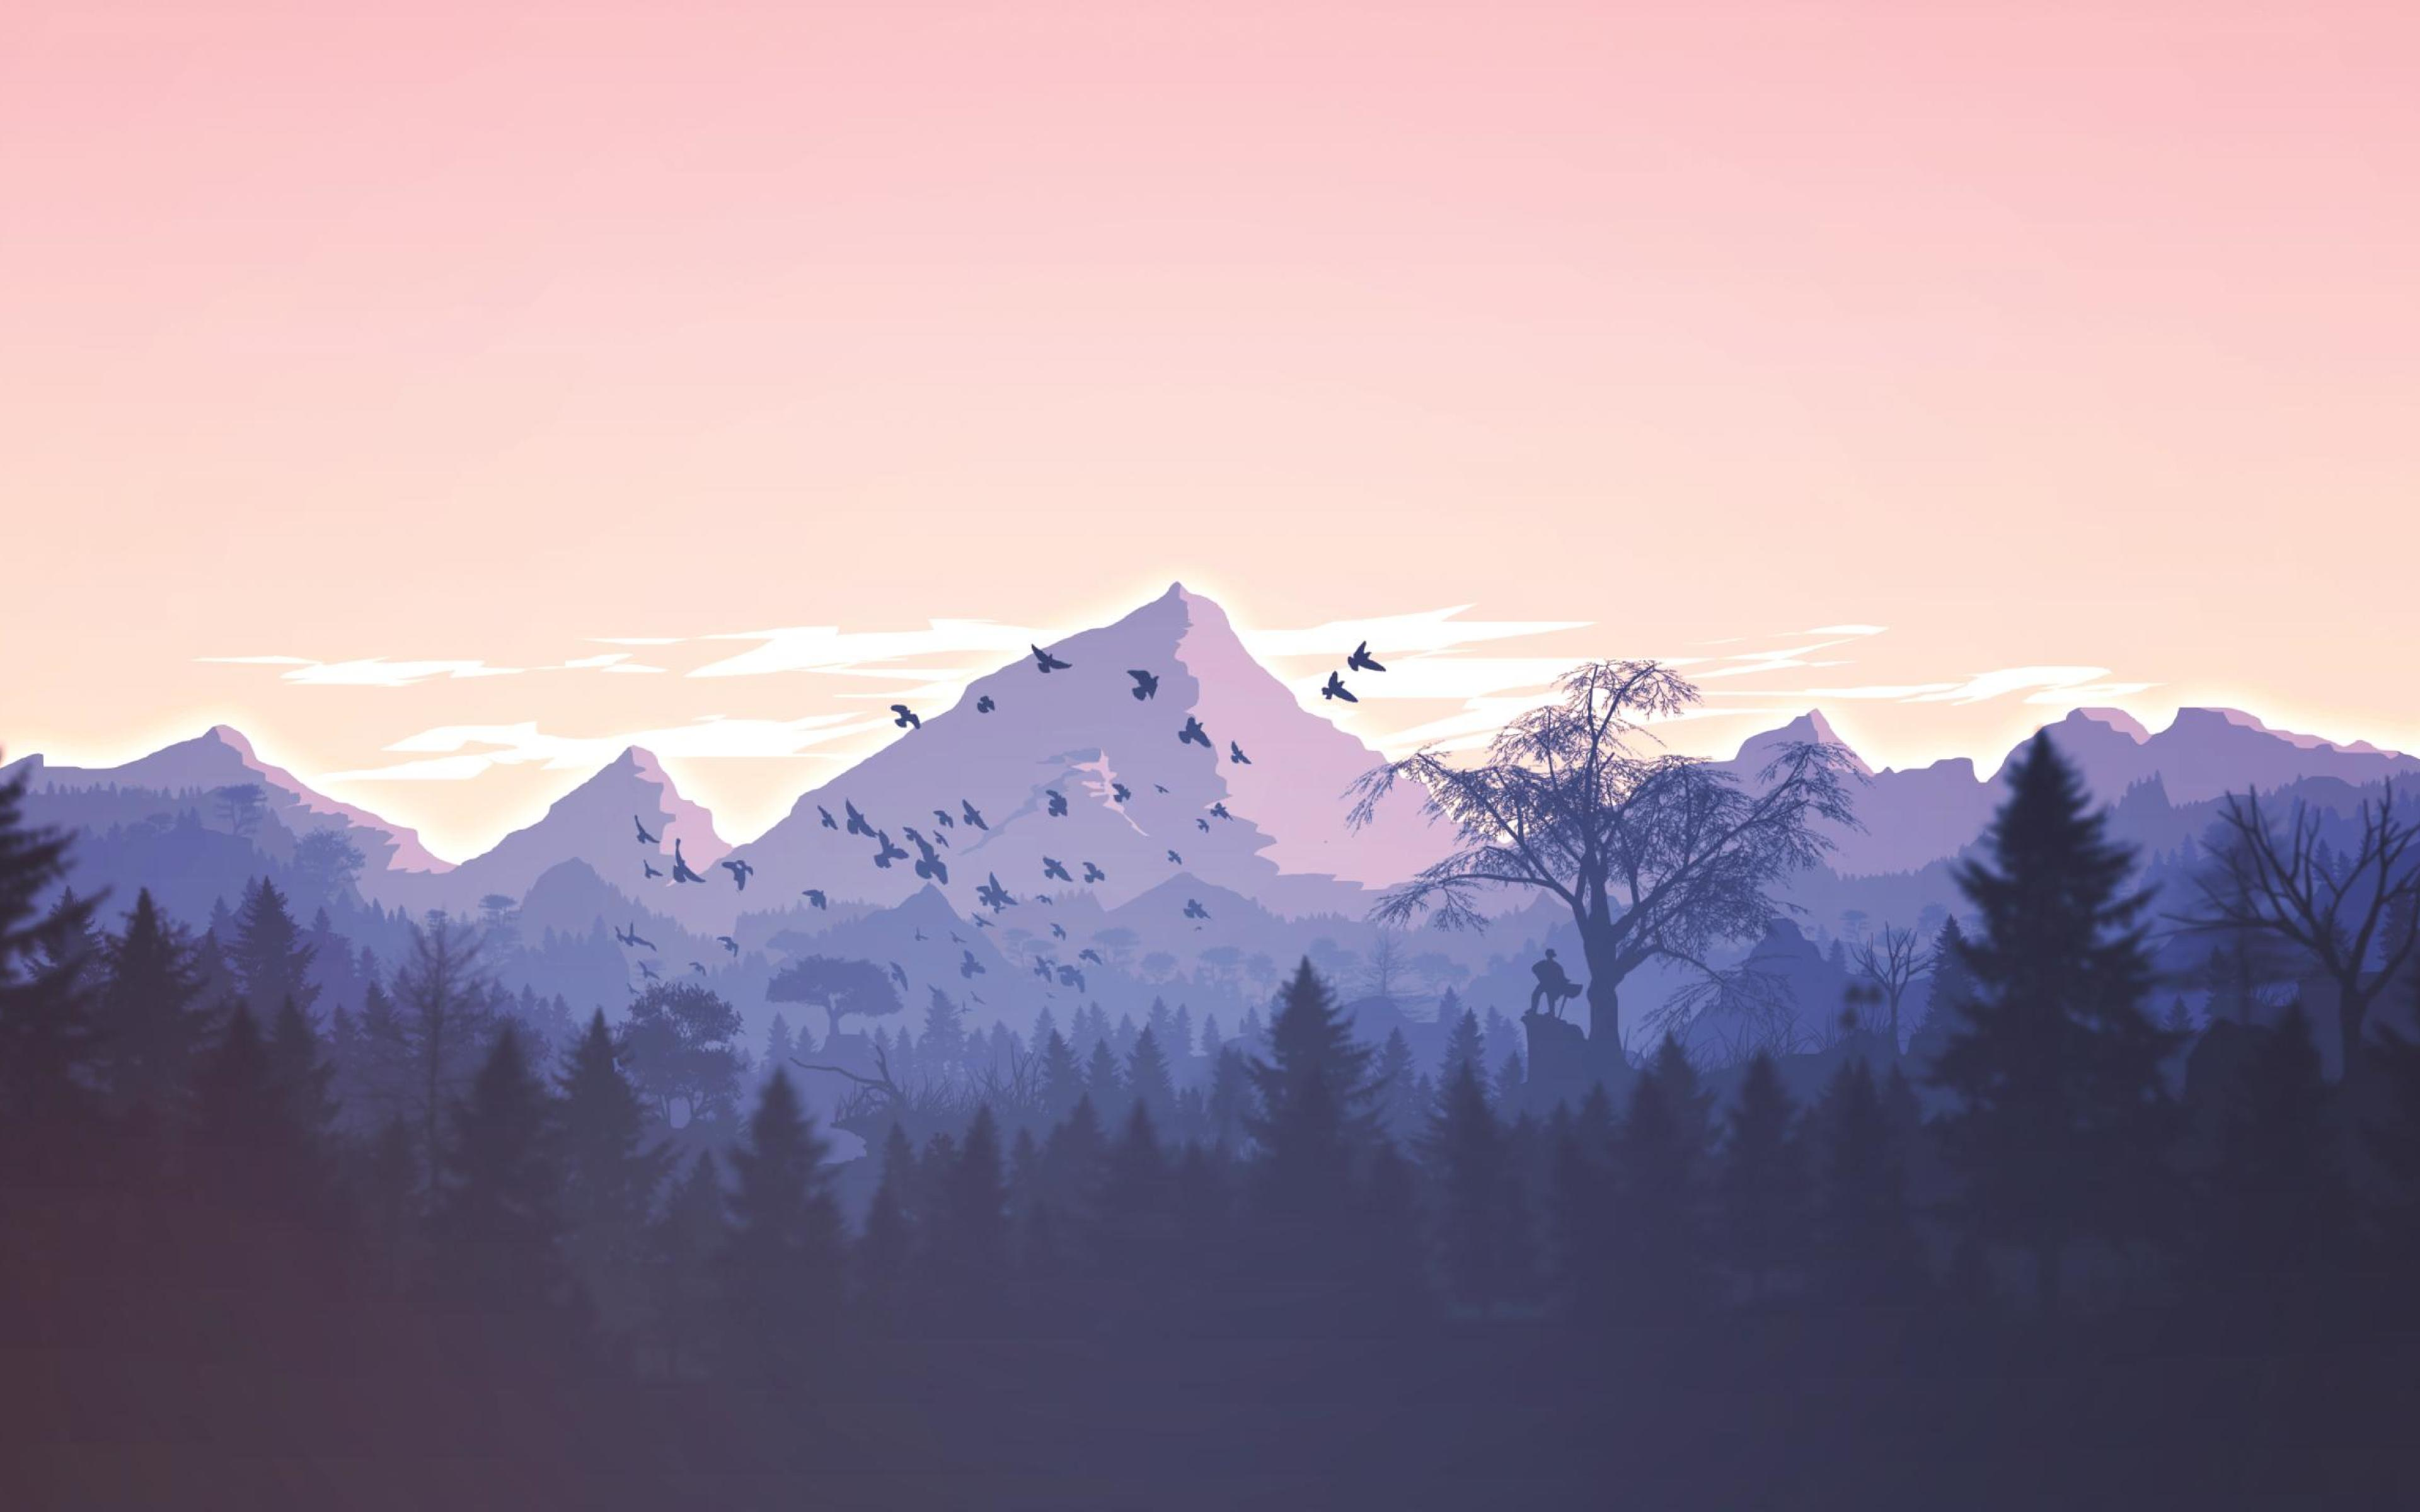 Minimalism Mountain Peak Full Hd Wallpaper: Minimalism Birds Mountains Trees Forest, Full HD 2K Wallpaper